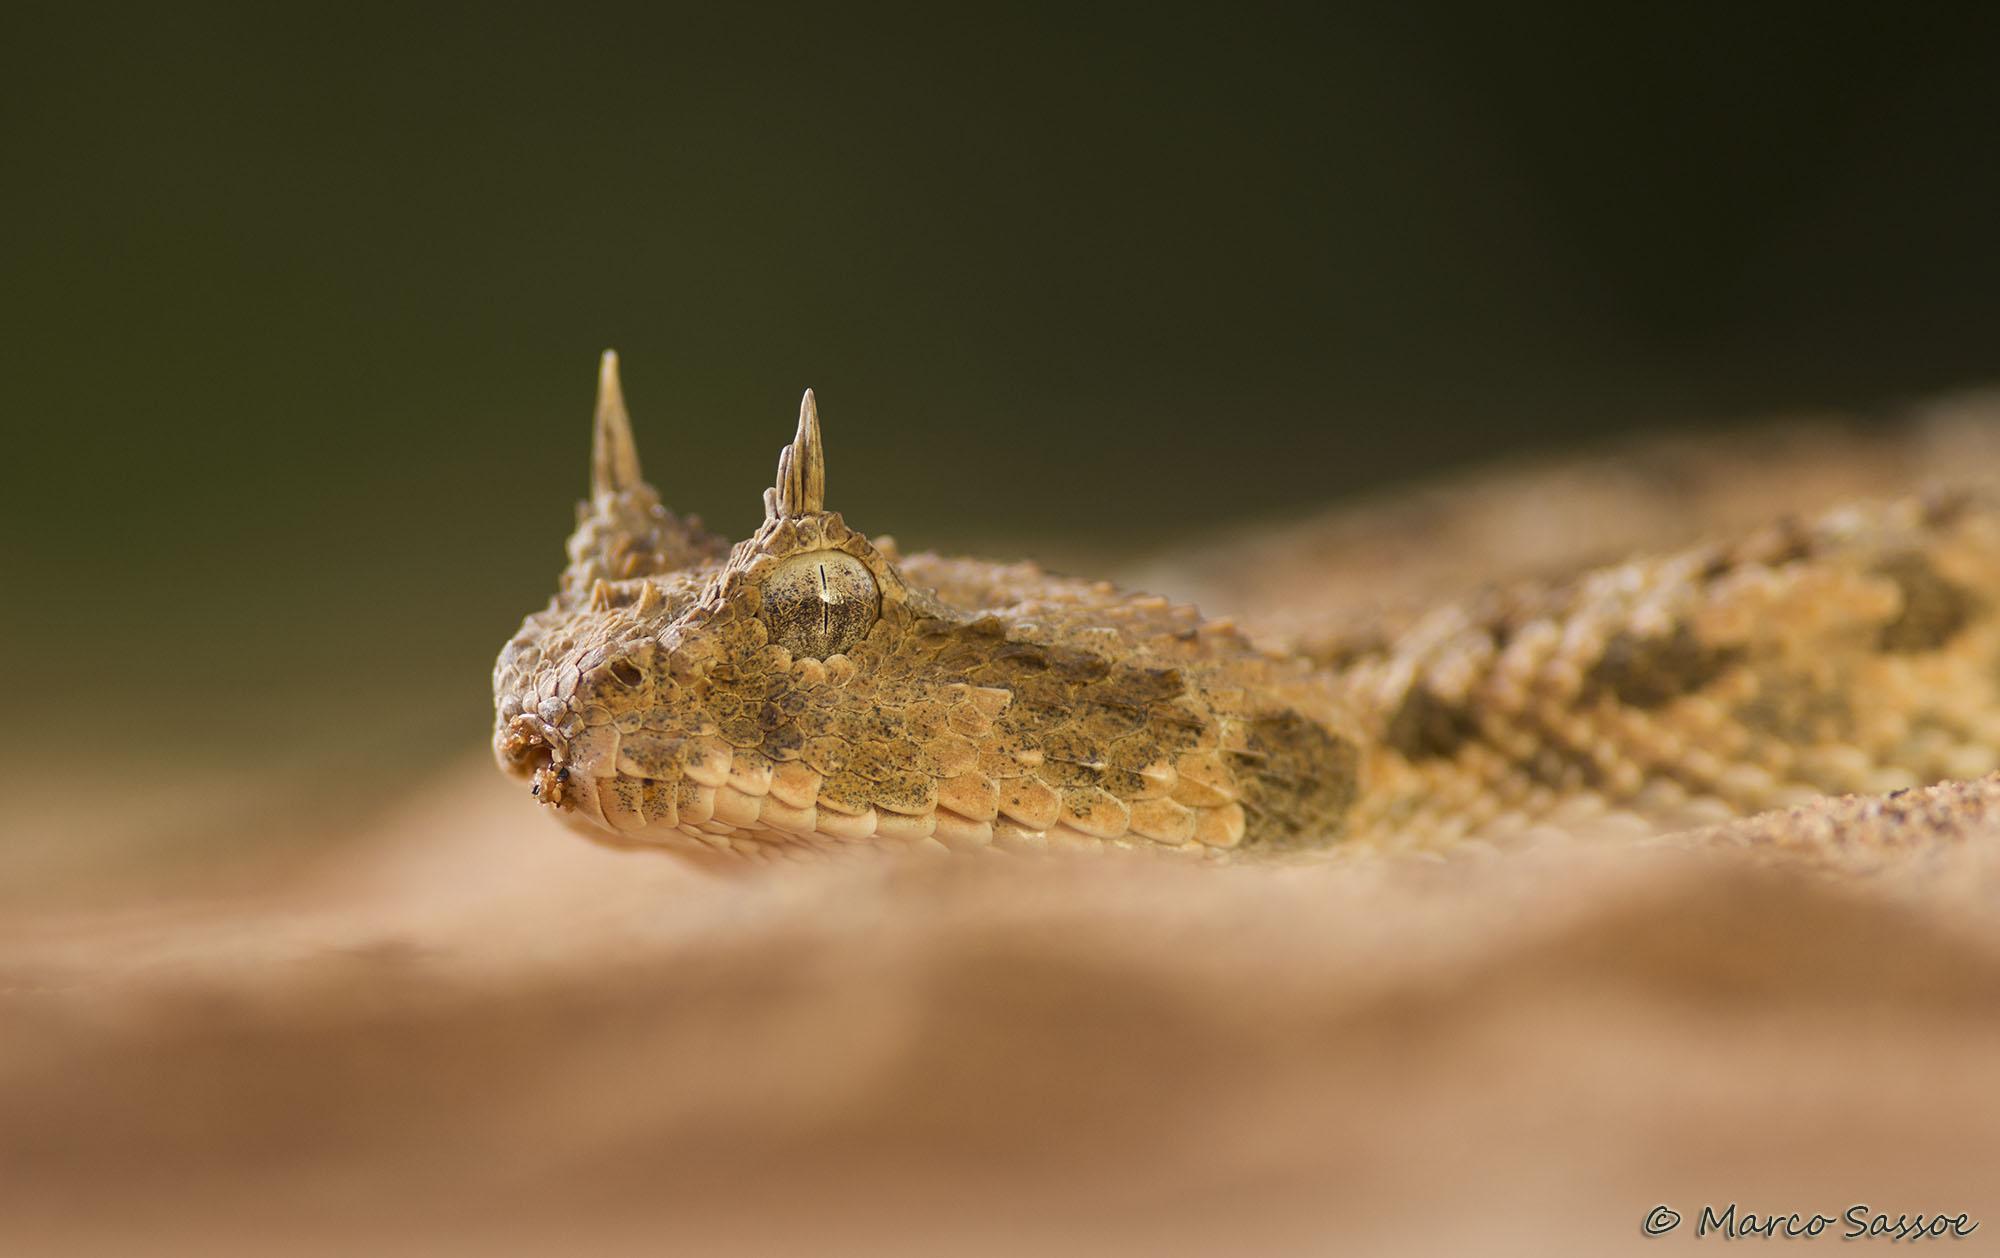 Cerastes cerastes, the horned viper of the Sahara, new...